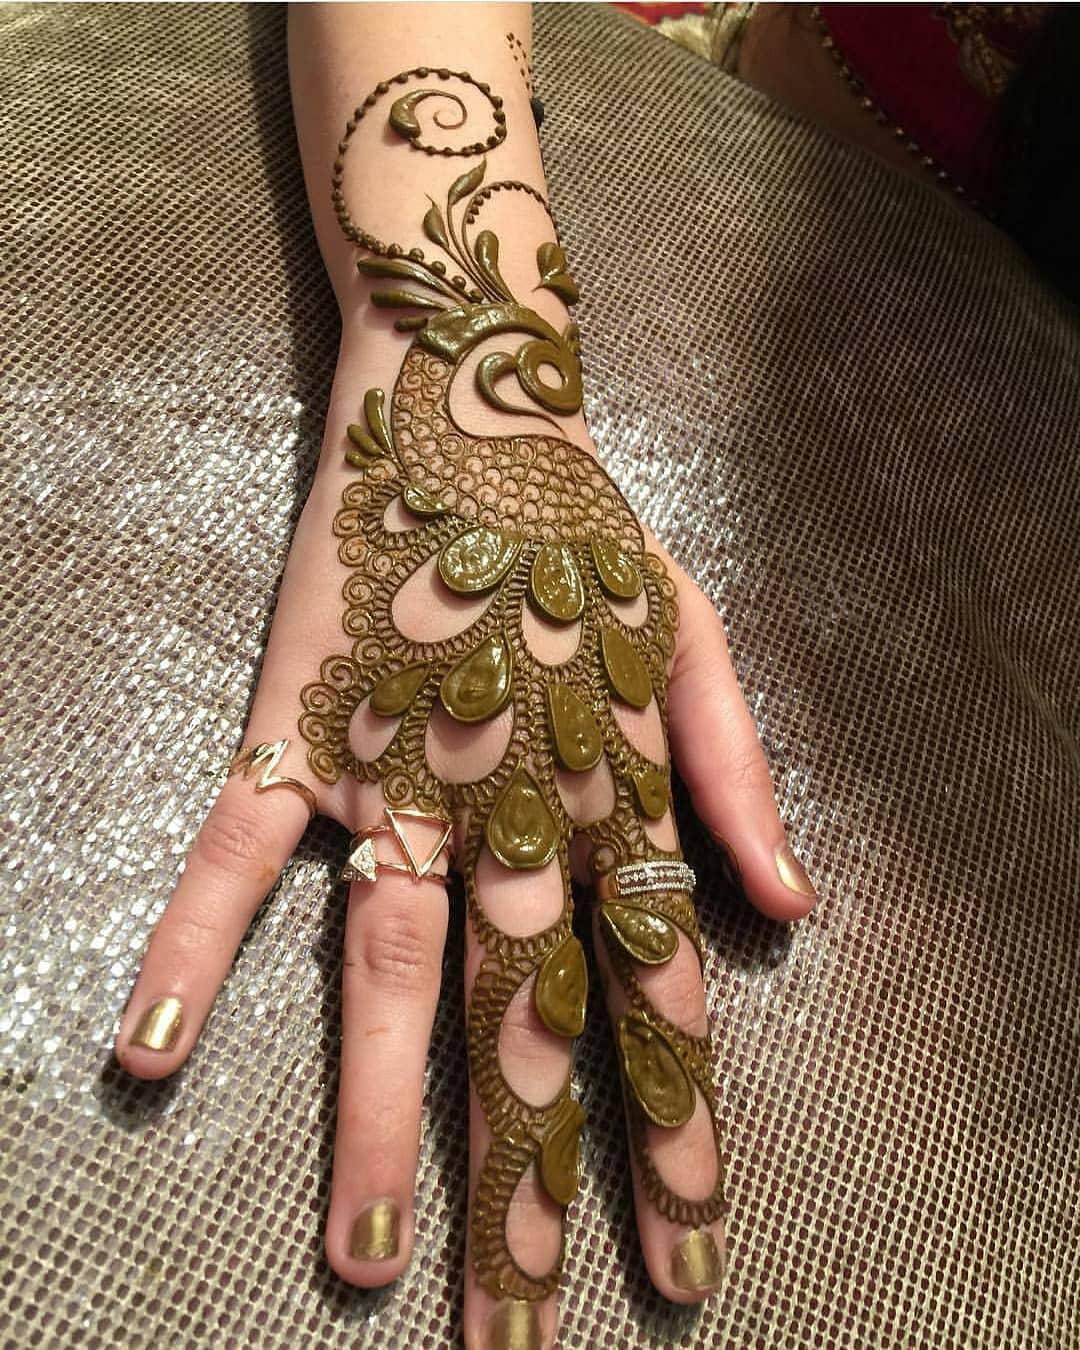 Adorable New Rakshabandhan Mehndi Designs For 2018 | Simple & Easy Rakshabandhan Mehndi Design To Try This Year | Simple Mehndi Designs For Beginners | Latest Rakhi Mehandi Designs | Peacock Mehndi Designs